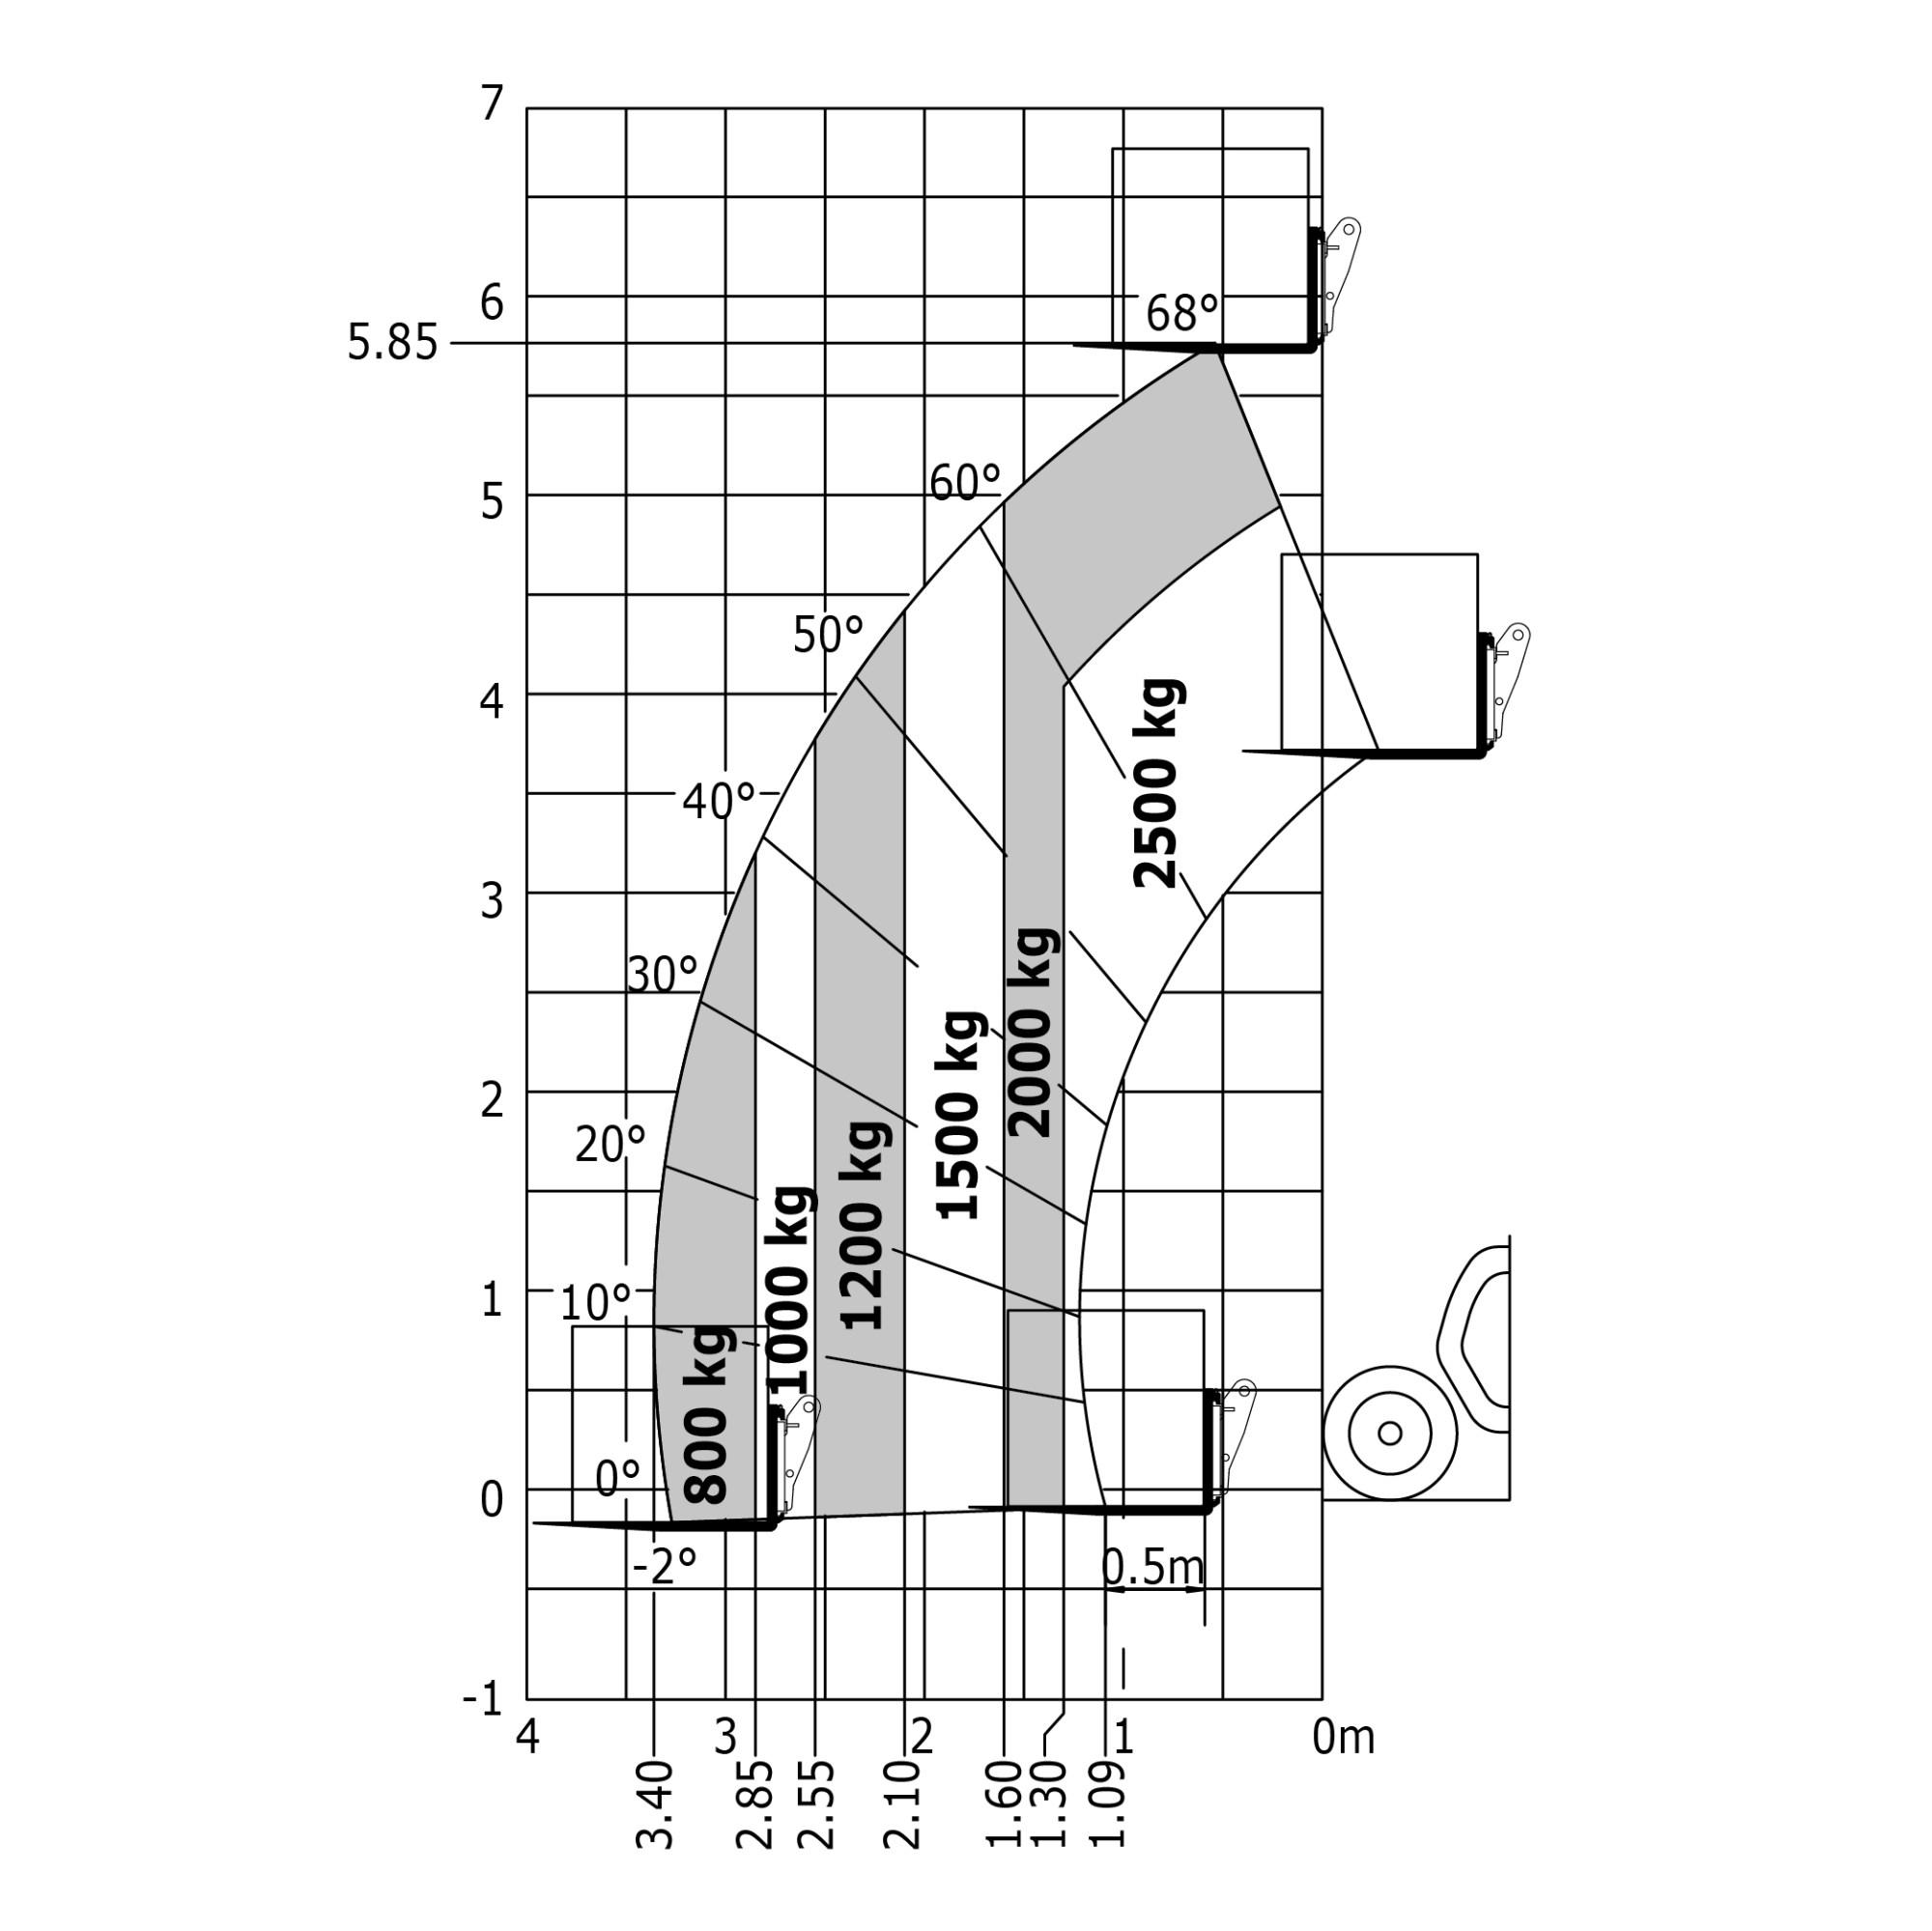 hight resolution of 520 jcb wiring diagram